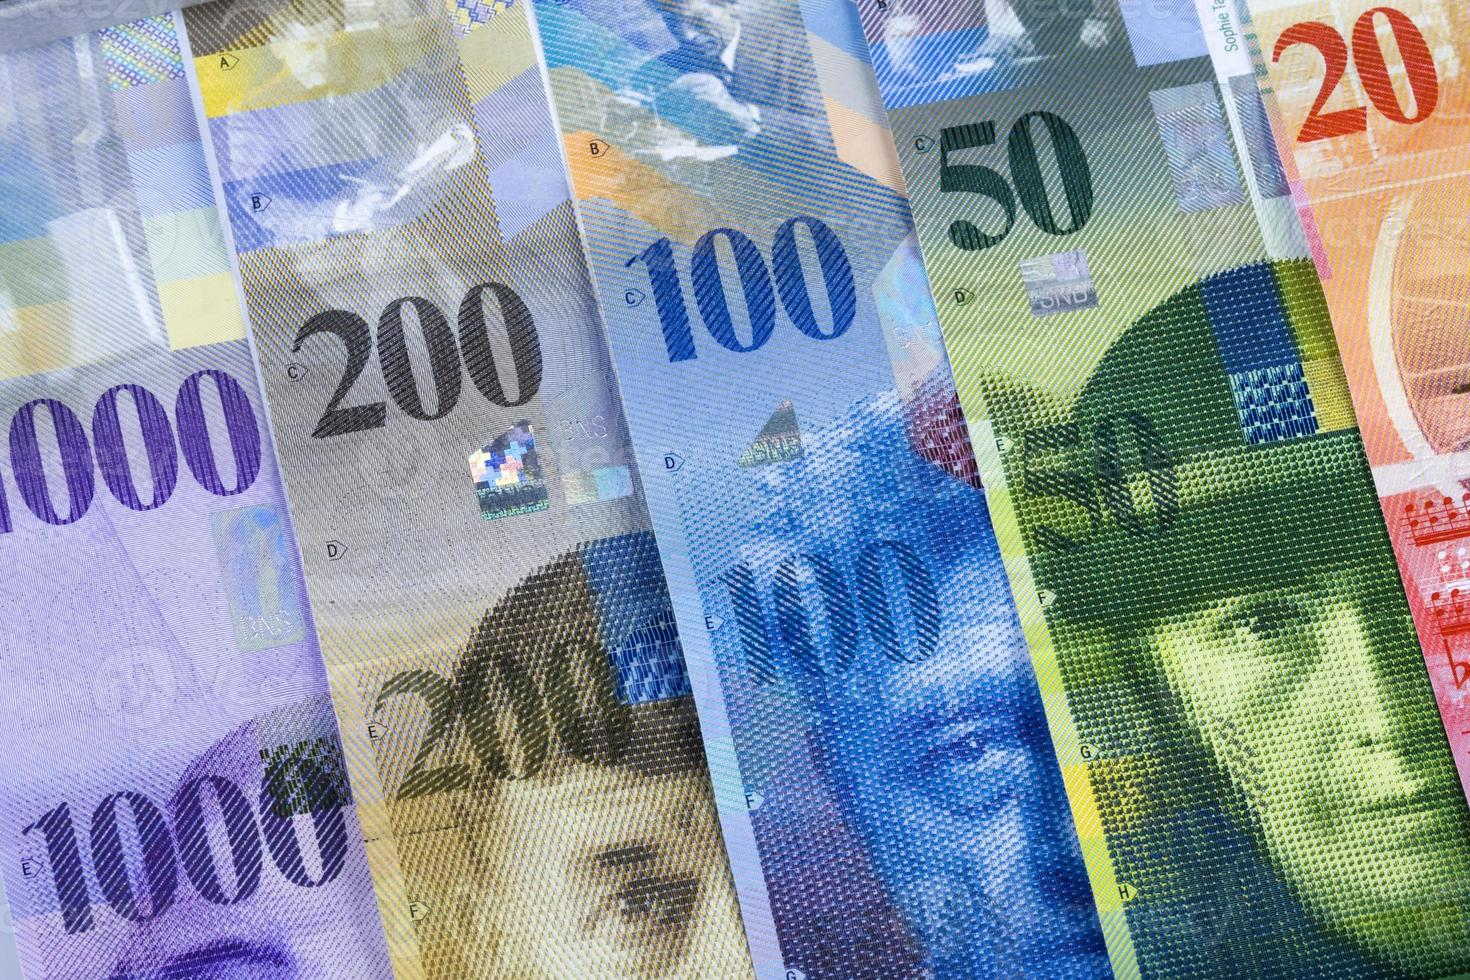 billetes de franco suizo foto